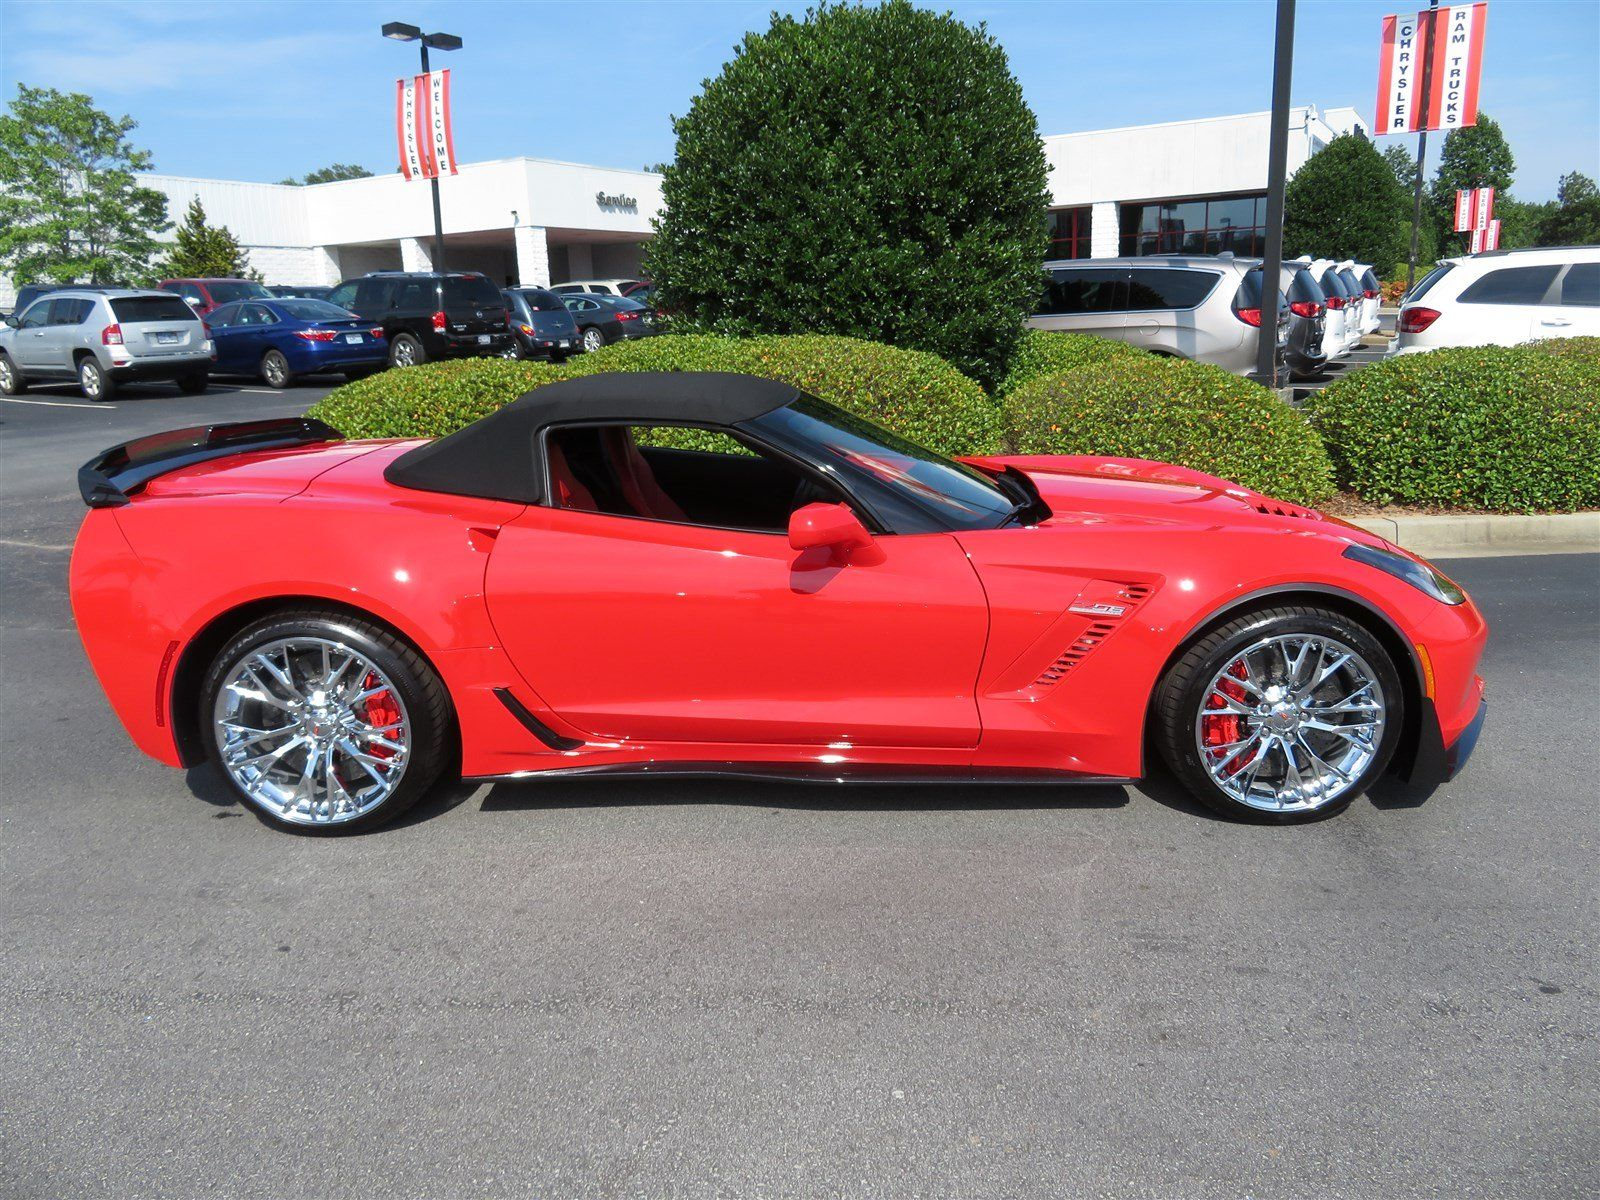 Cars For Sale Used 2015 Chevrolet Corvette Z06 Convertible For